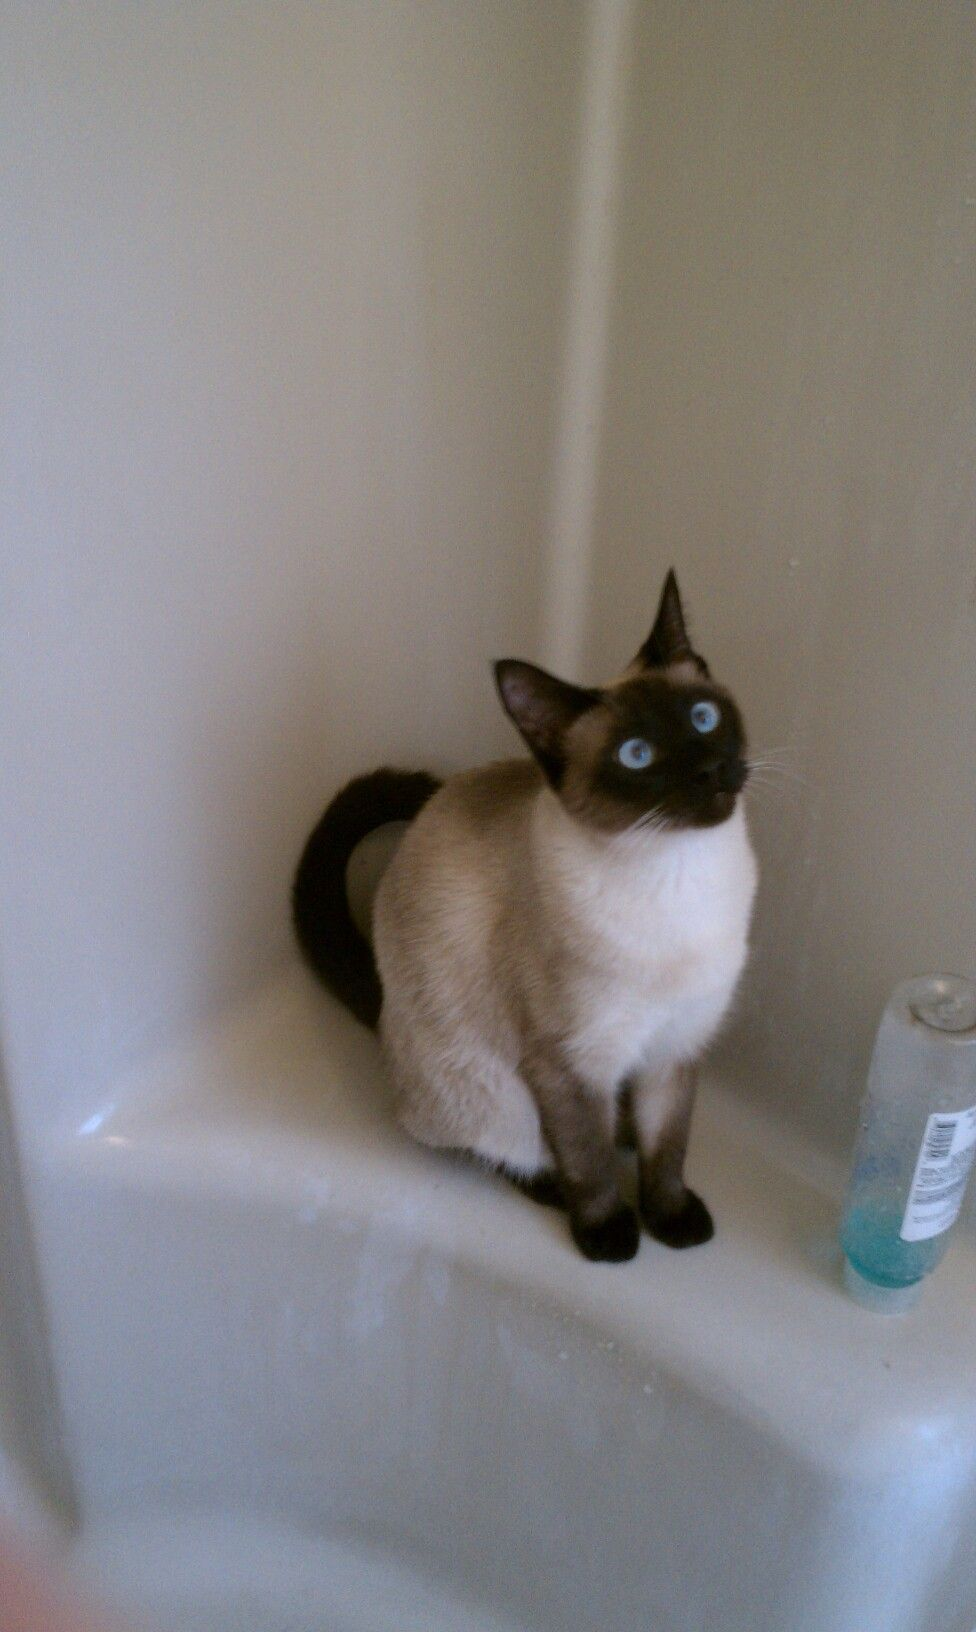 My cat Daizie